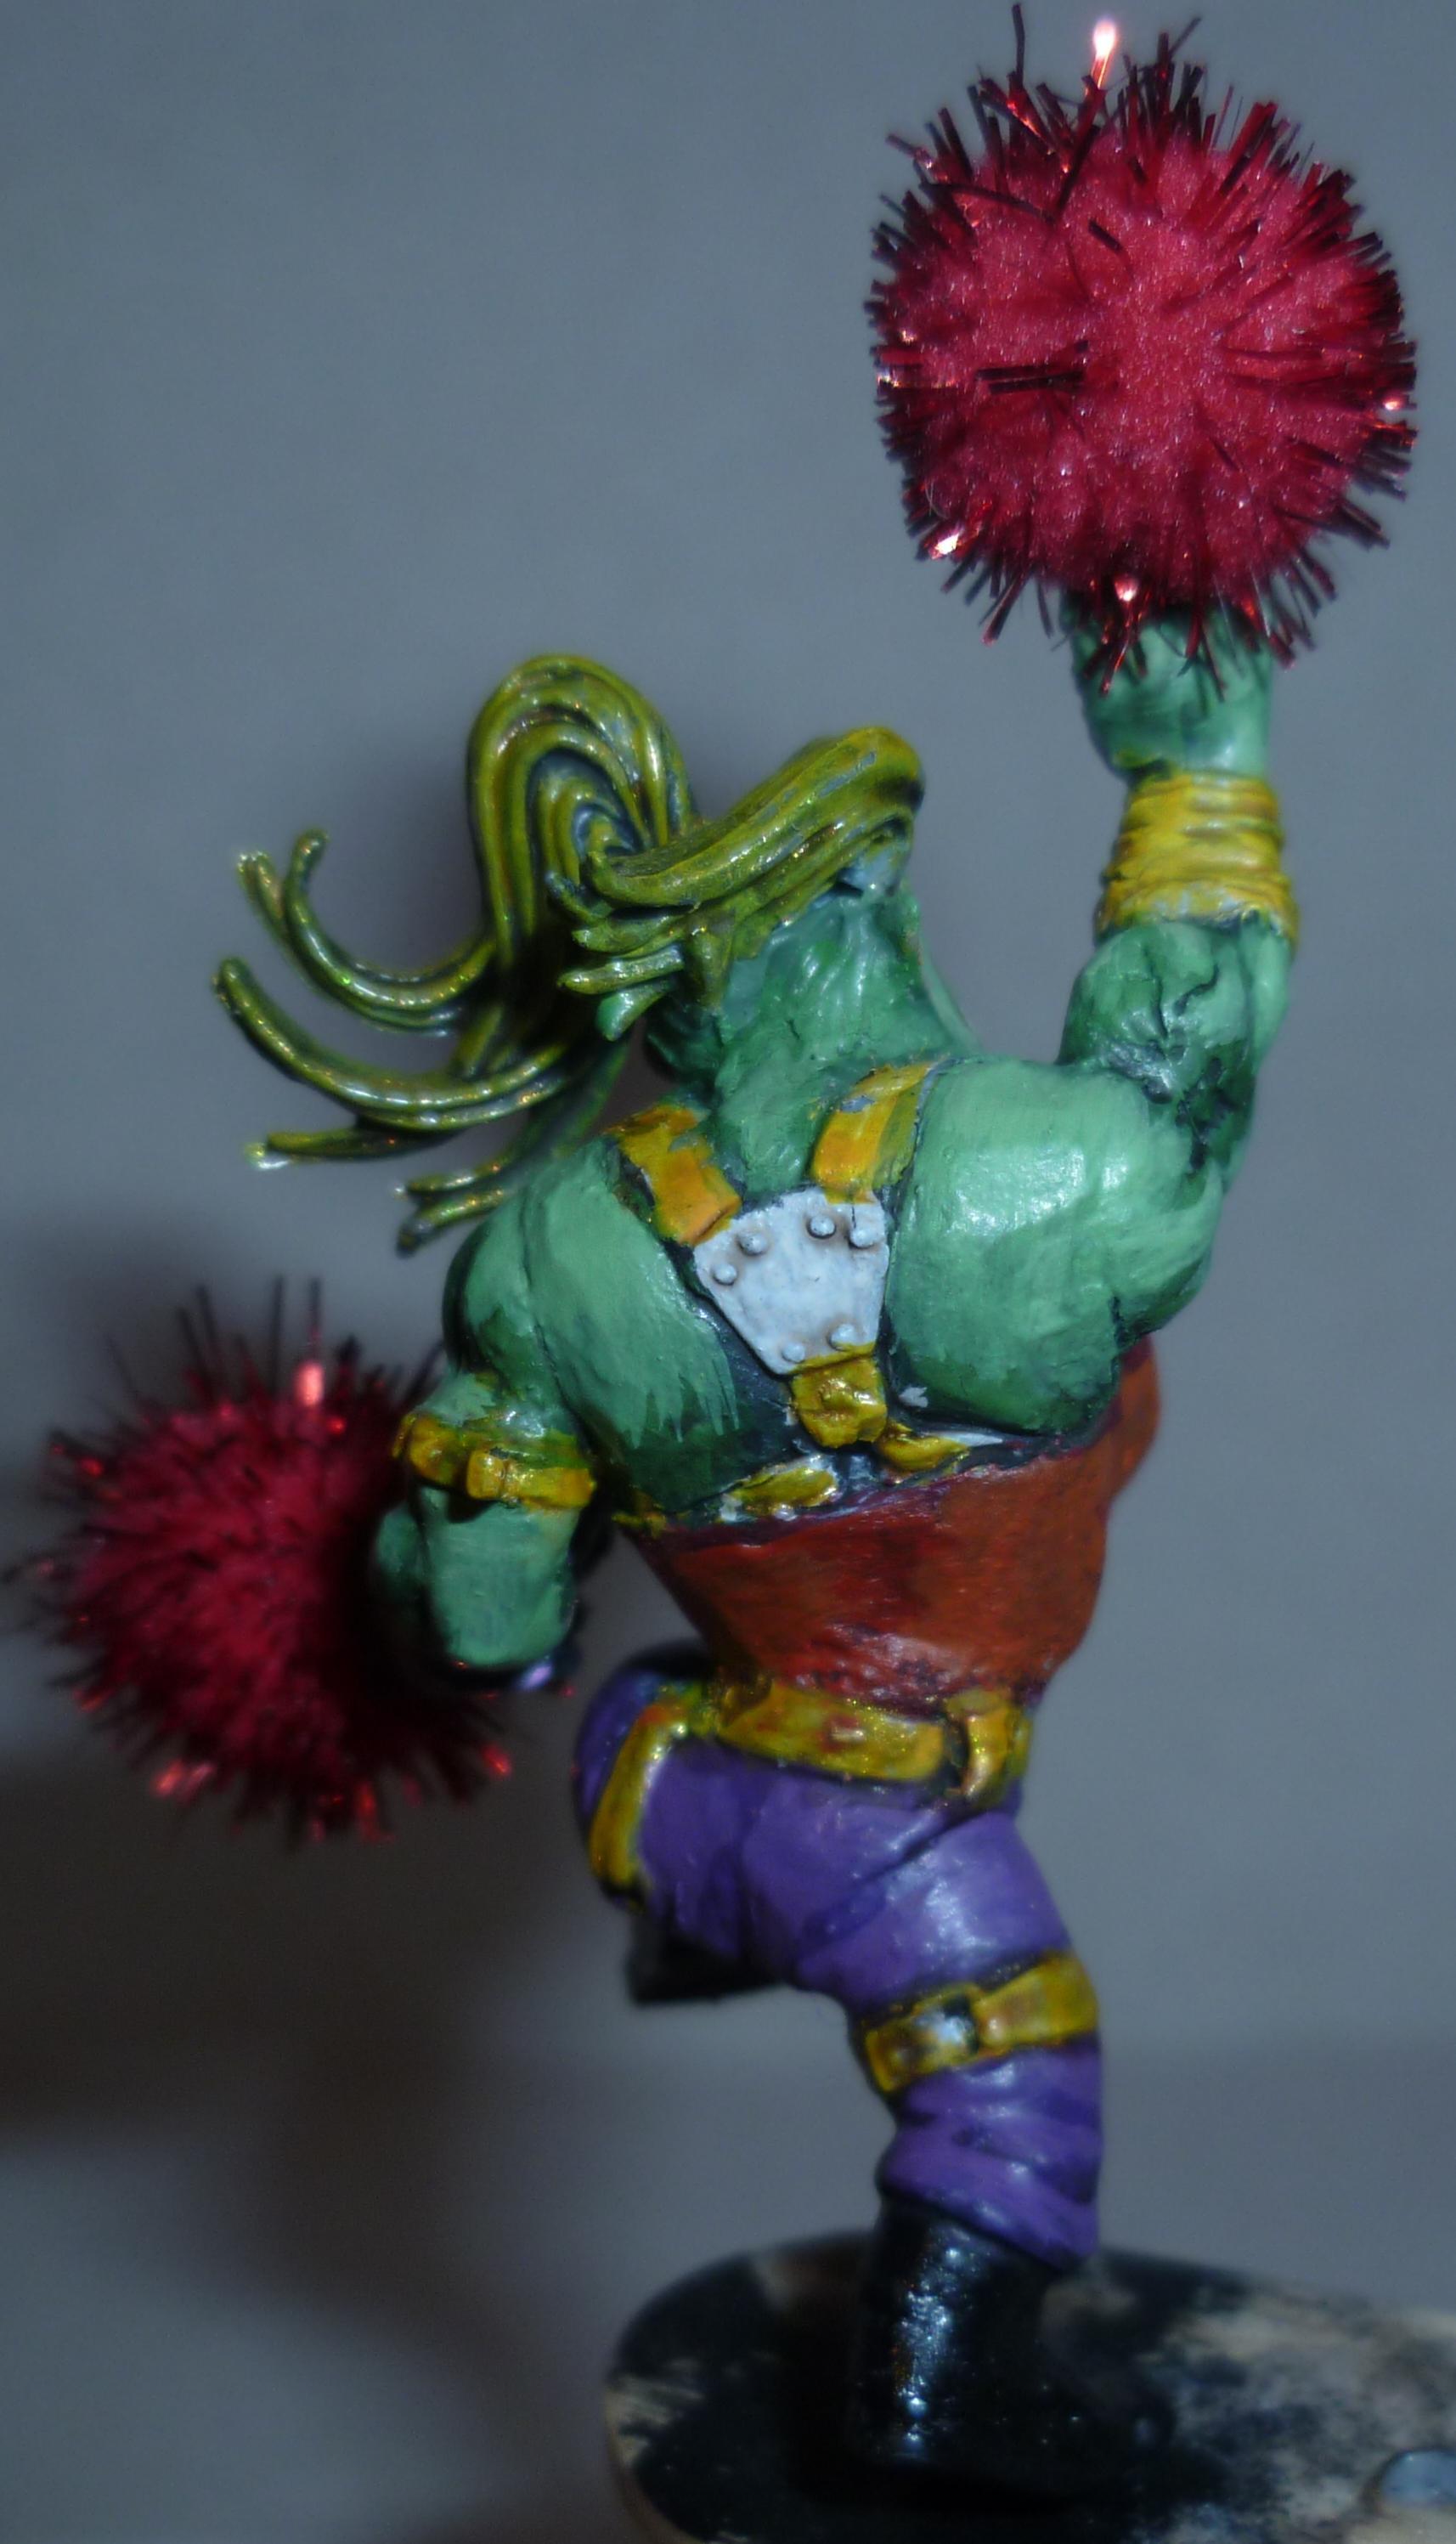 Ork Cheerleader, Ork Cheerleader